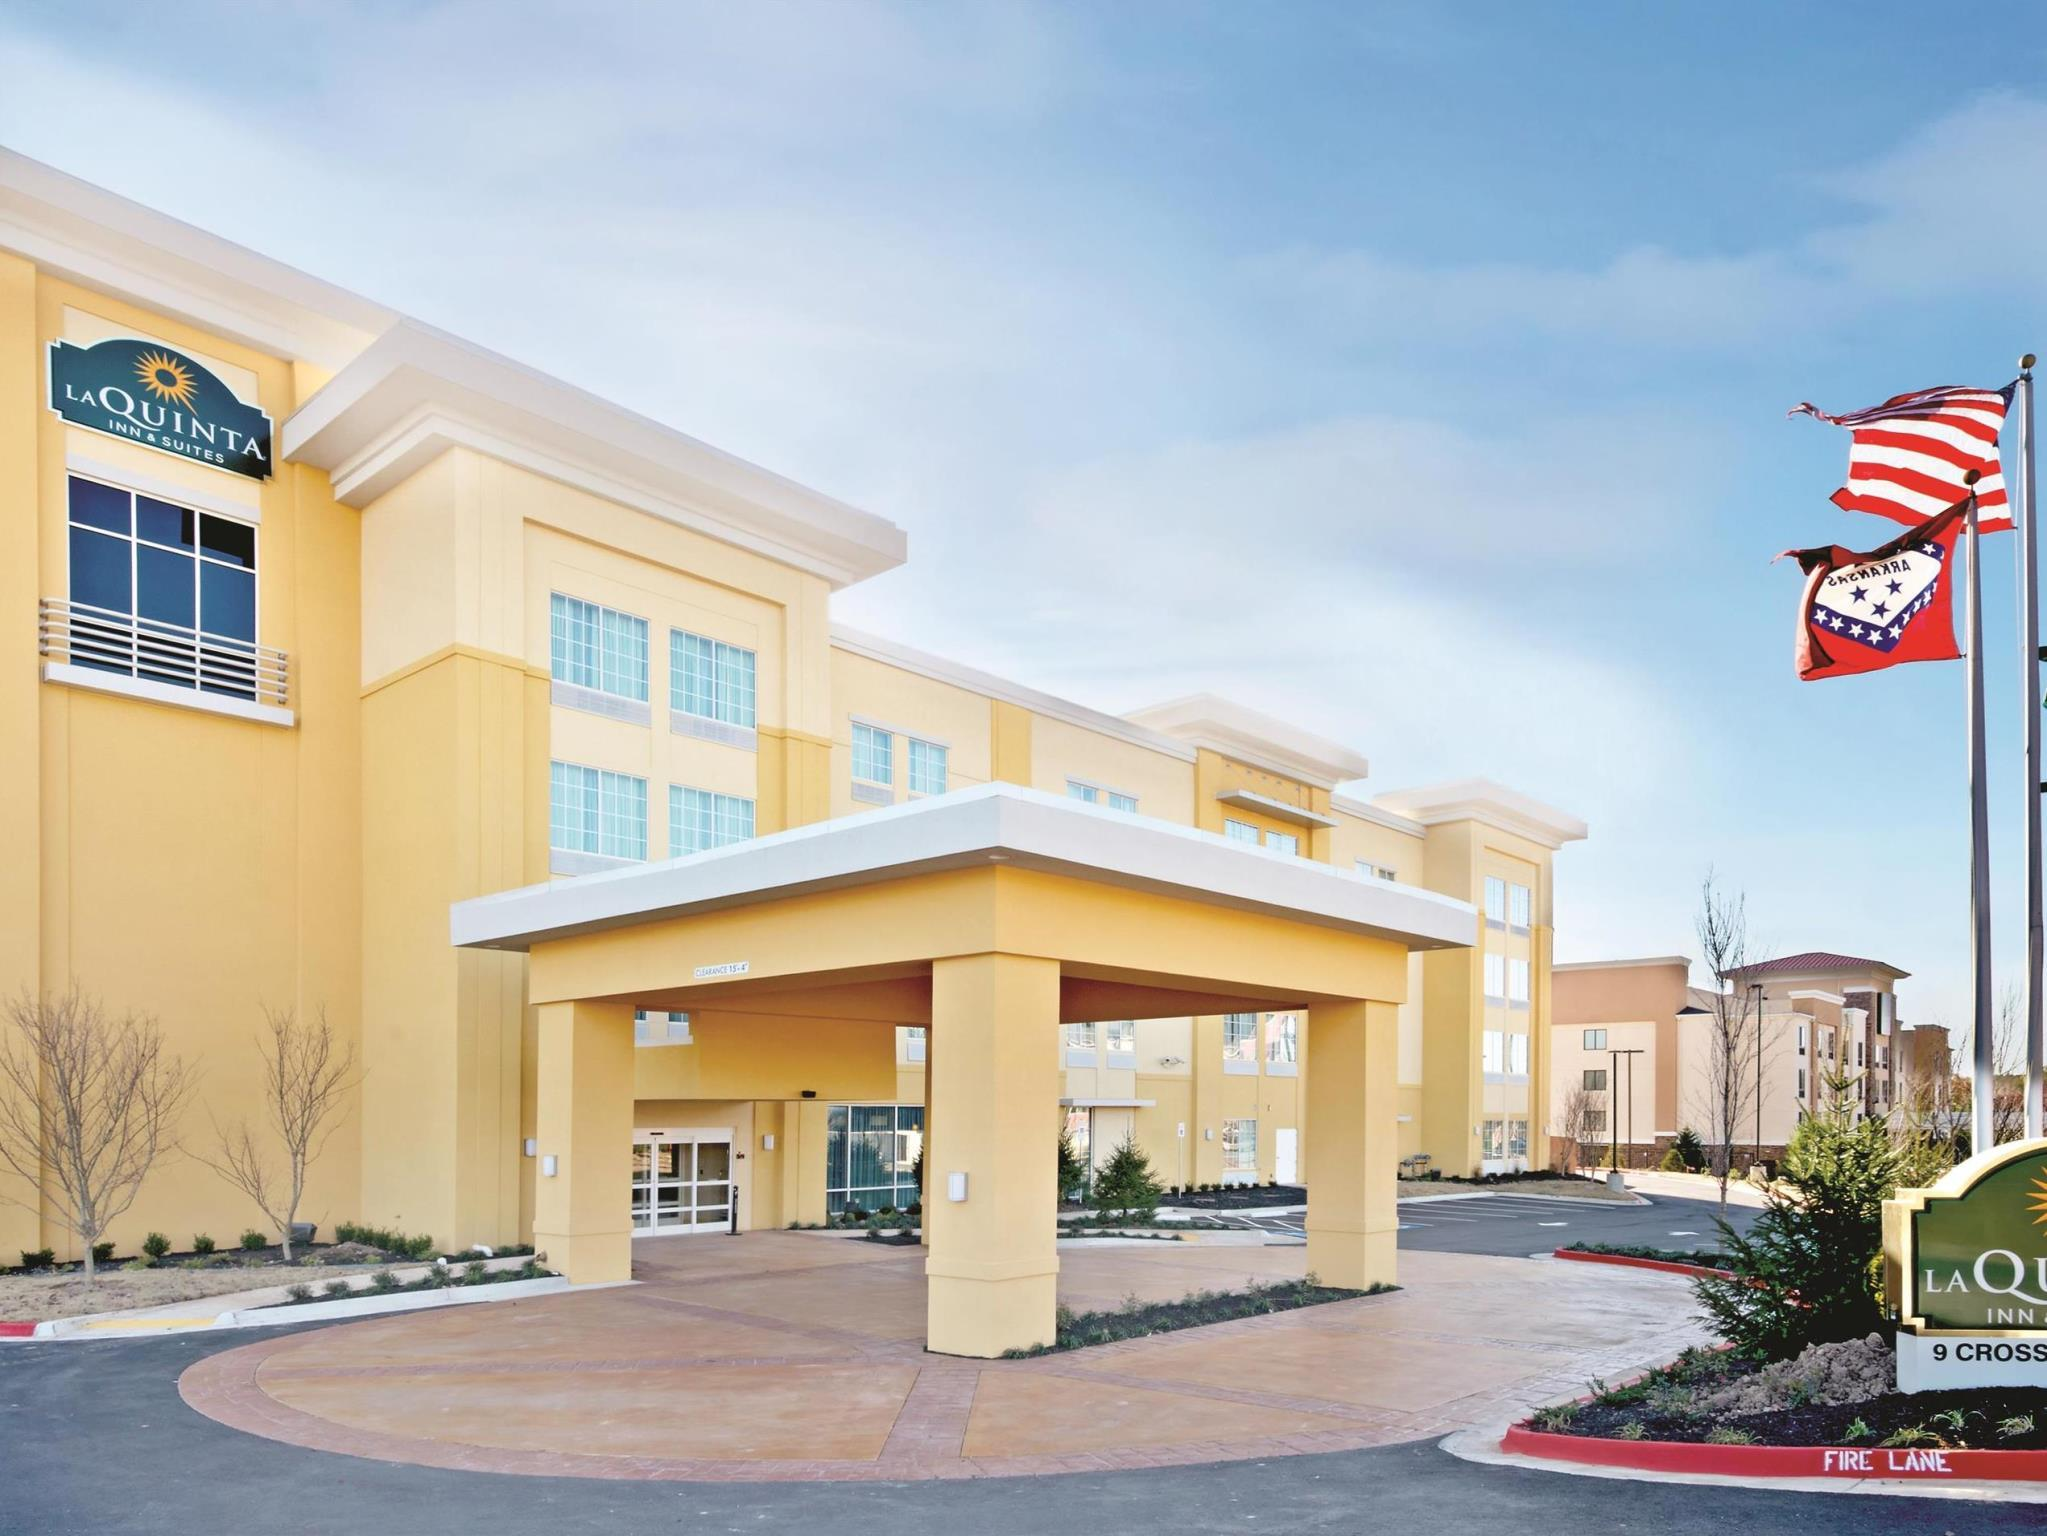 La Quinta Inn And Suites By Wyndham Little Rock   West